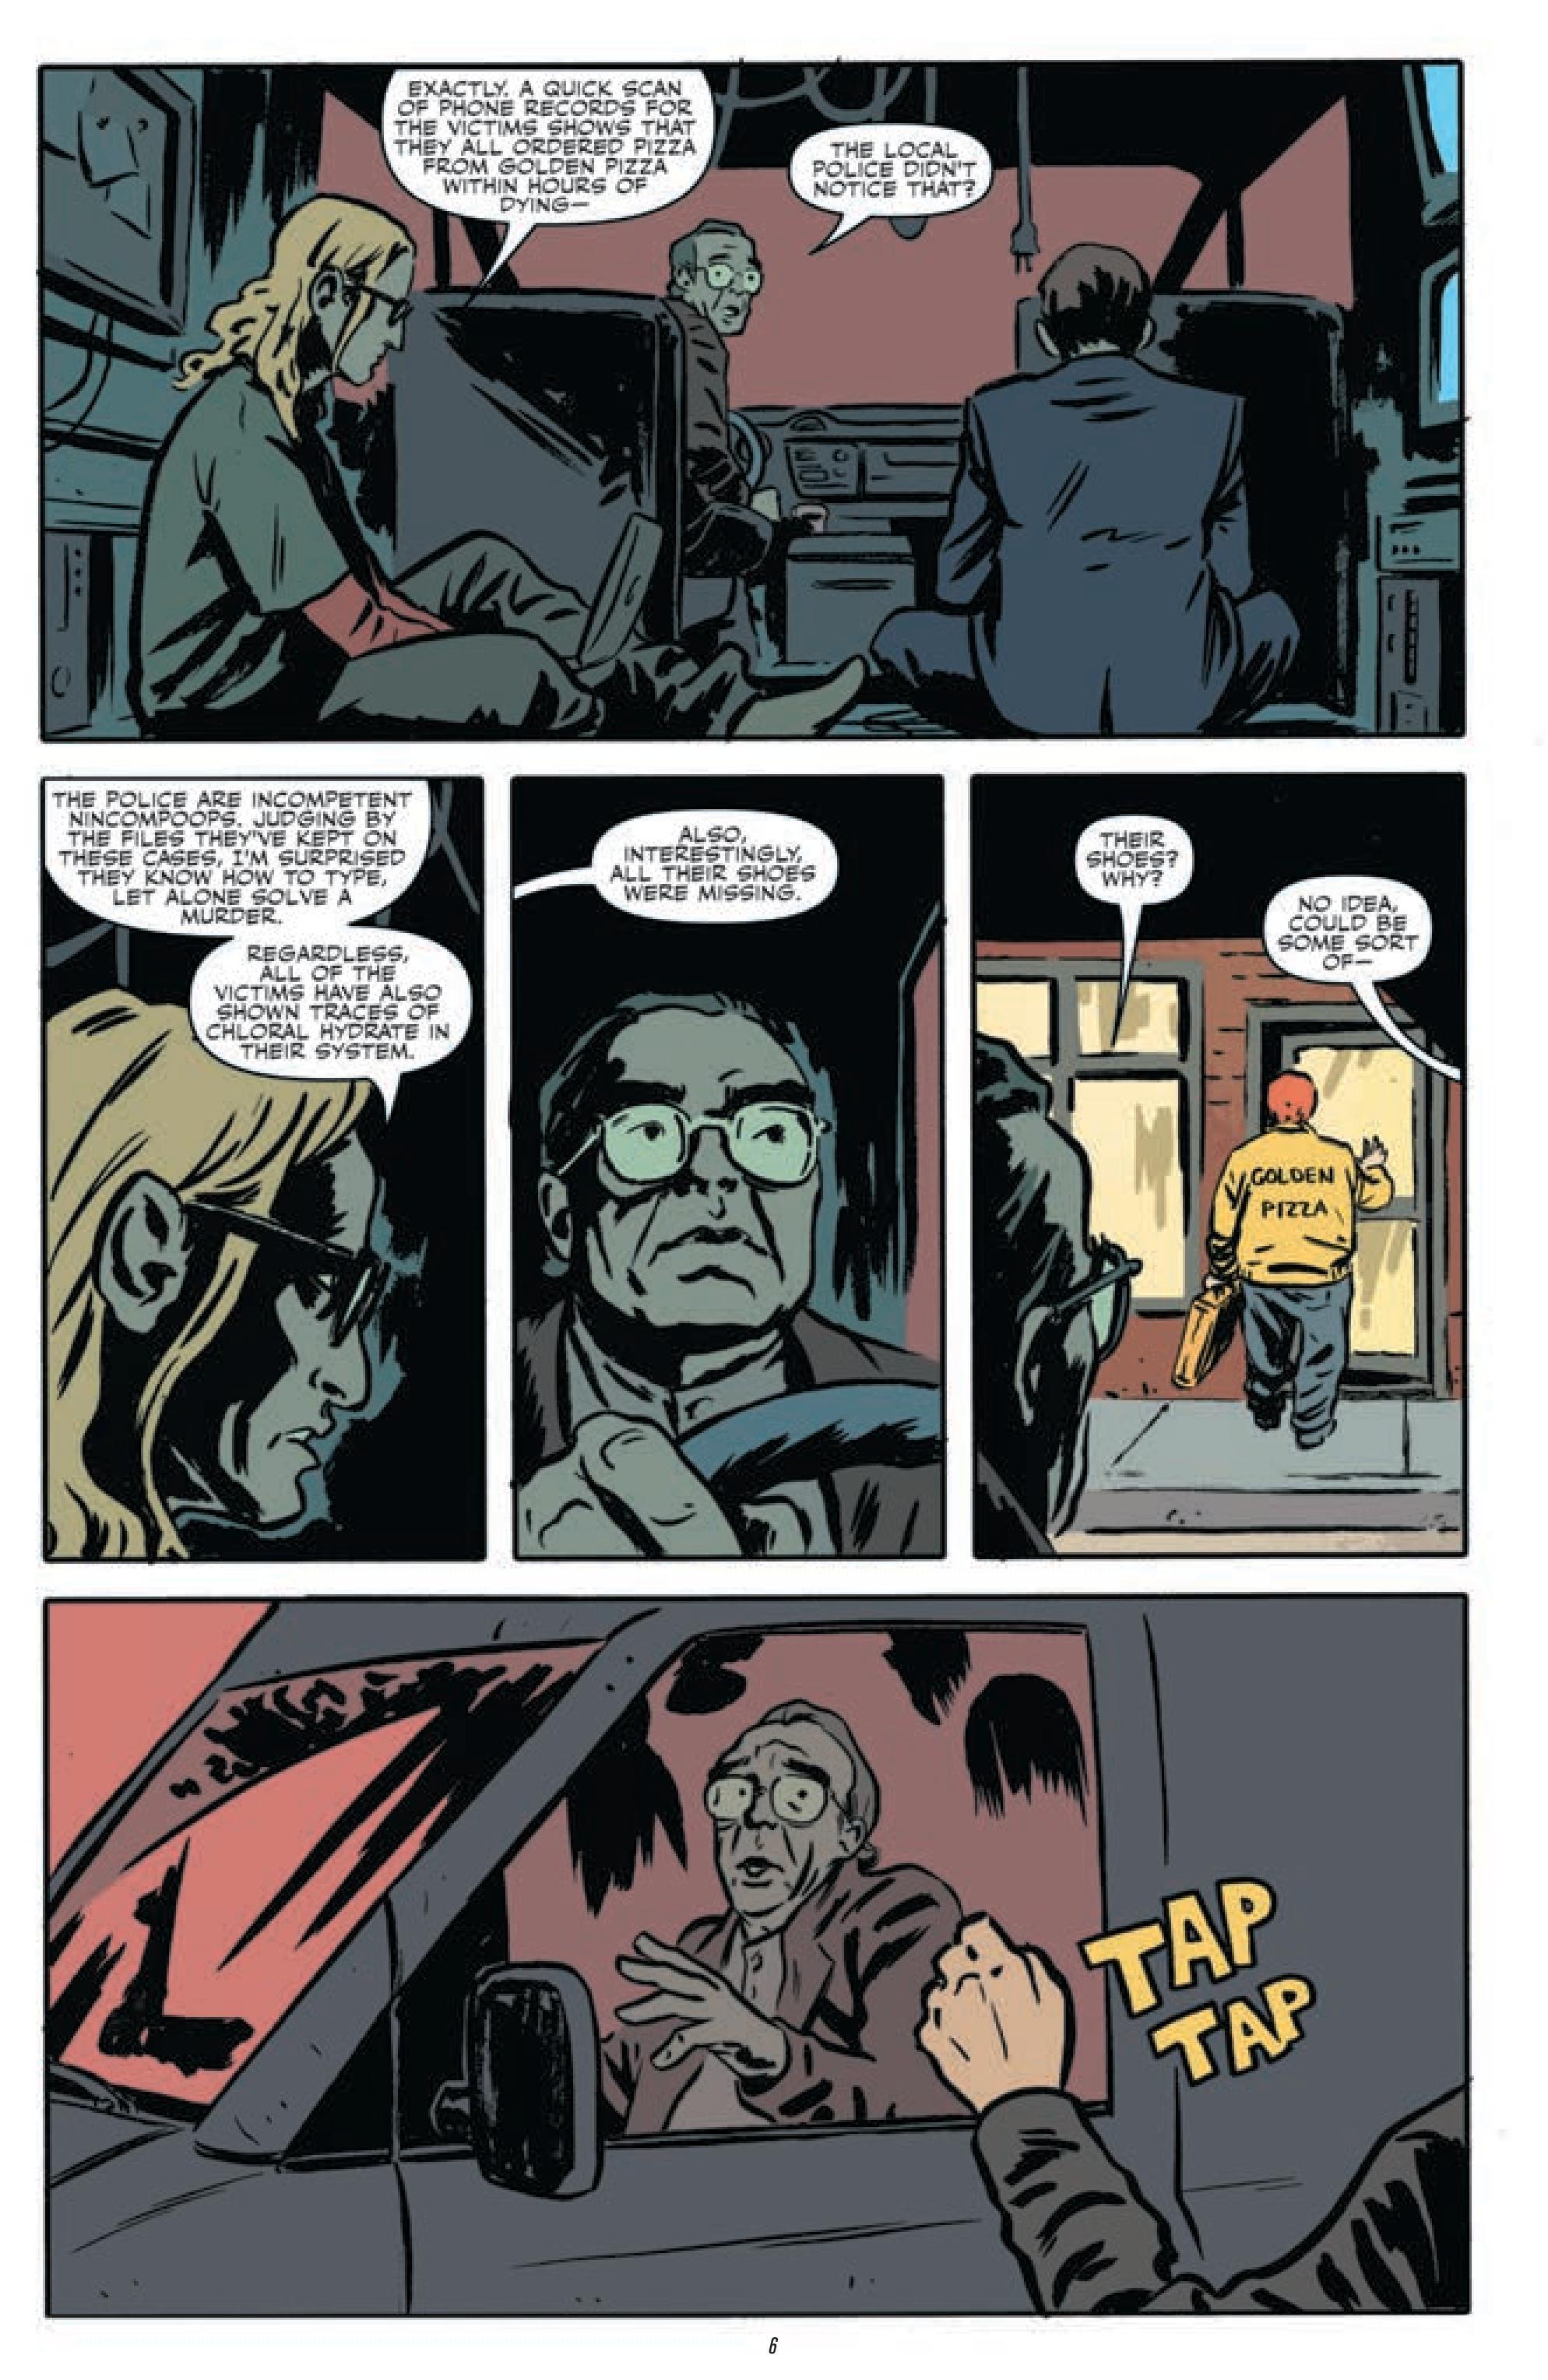 Xfiles_Conspiracy_TMNT-pr-page-008